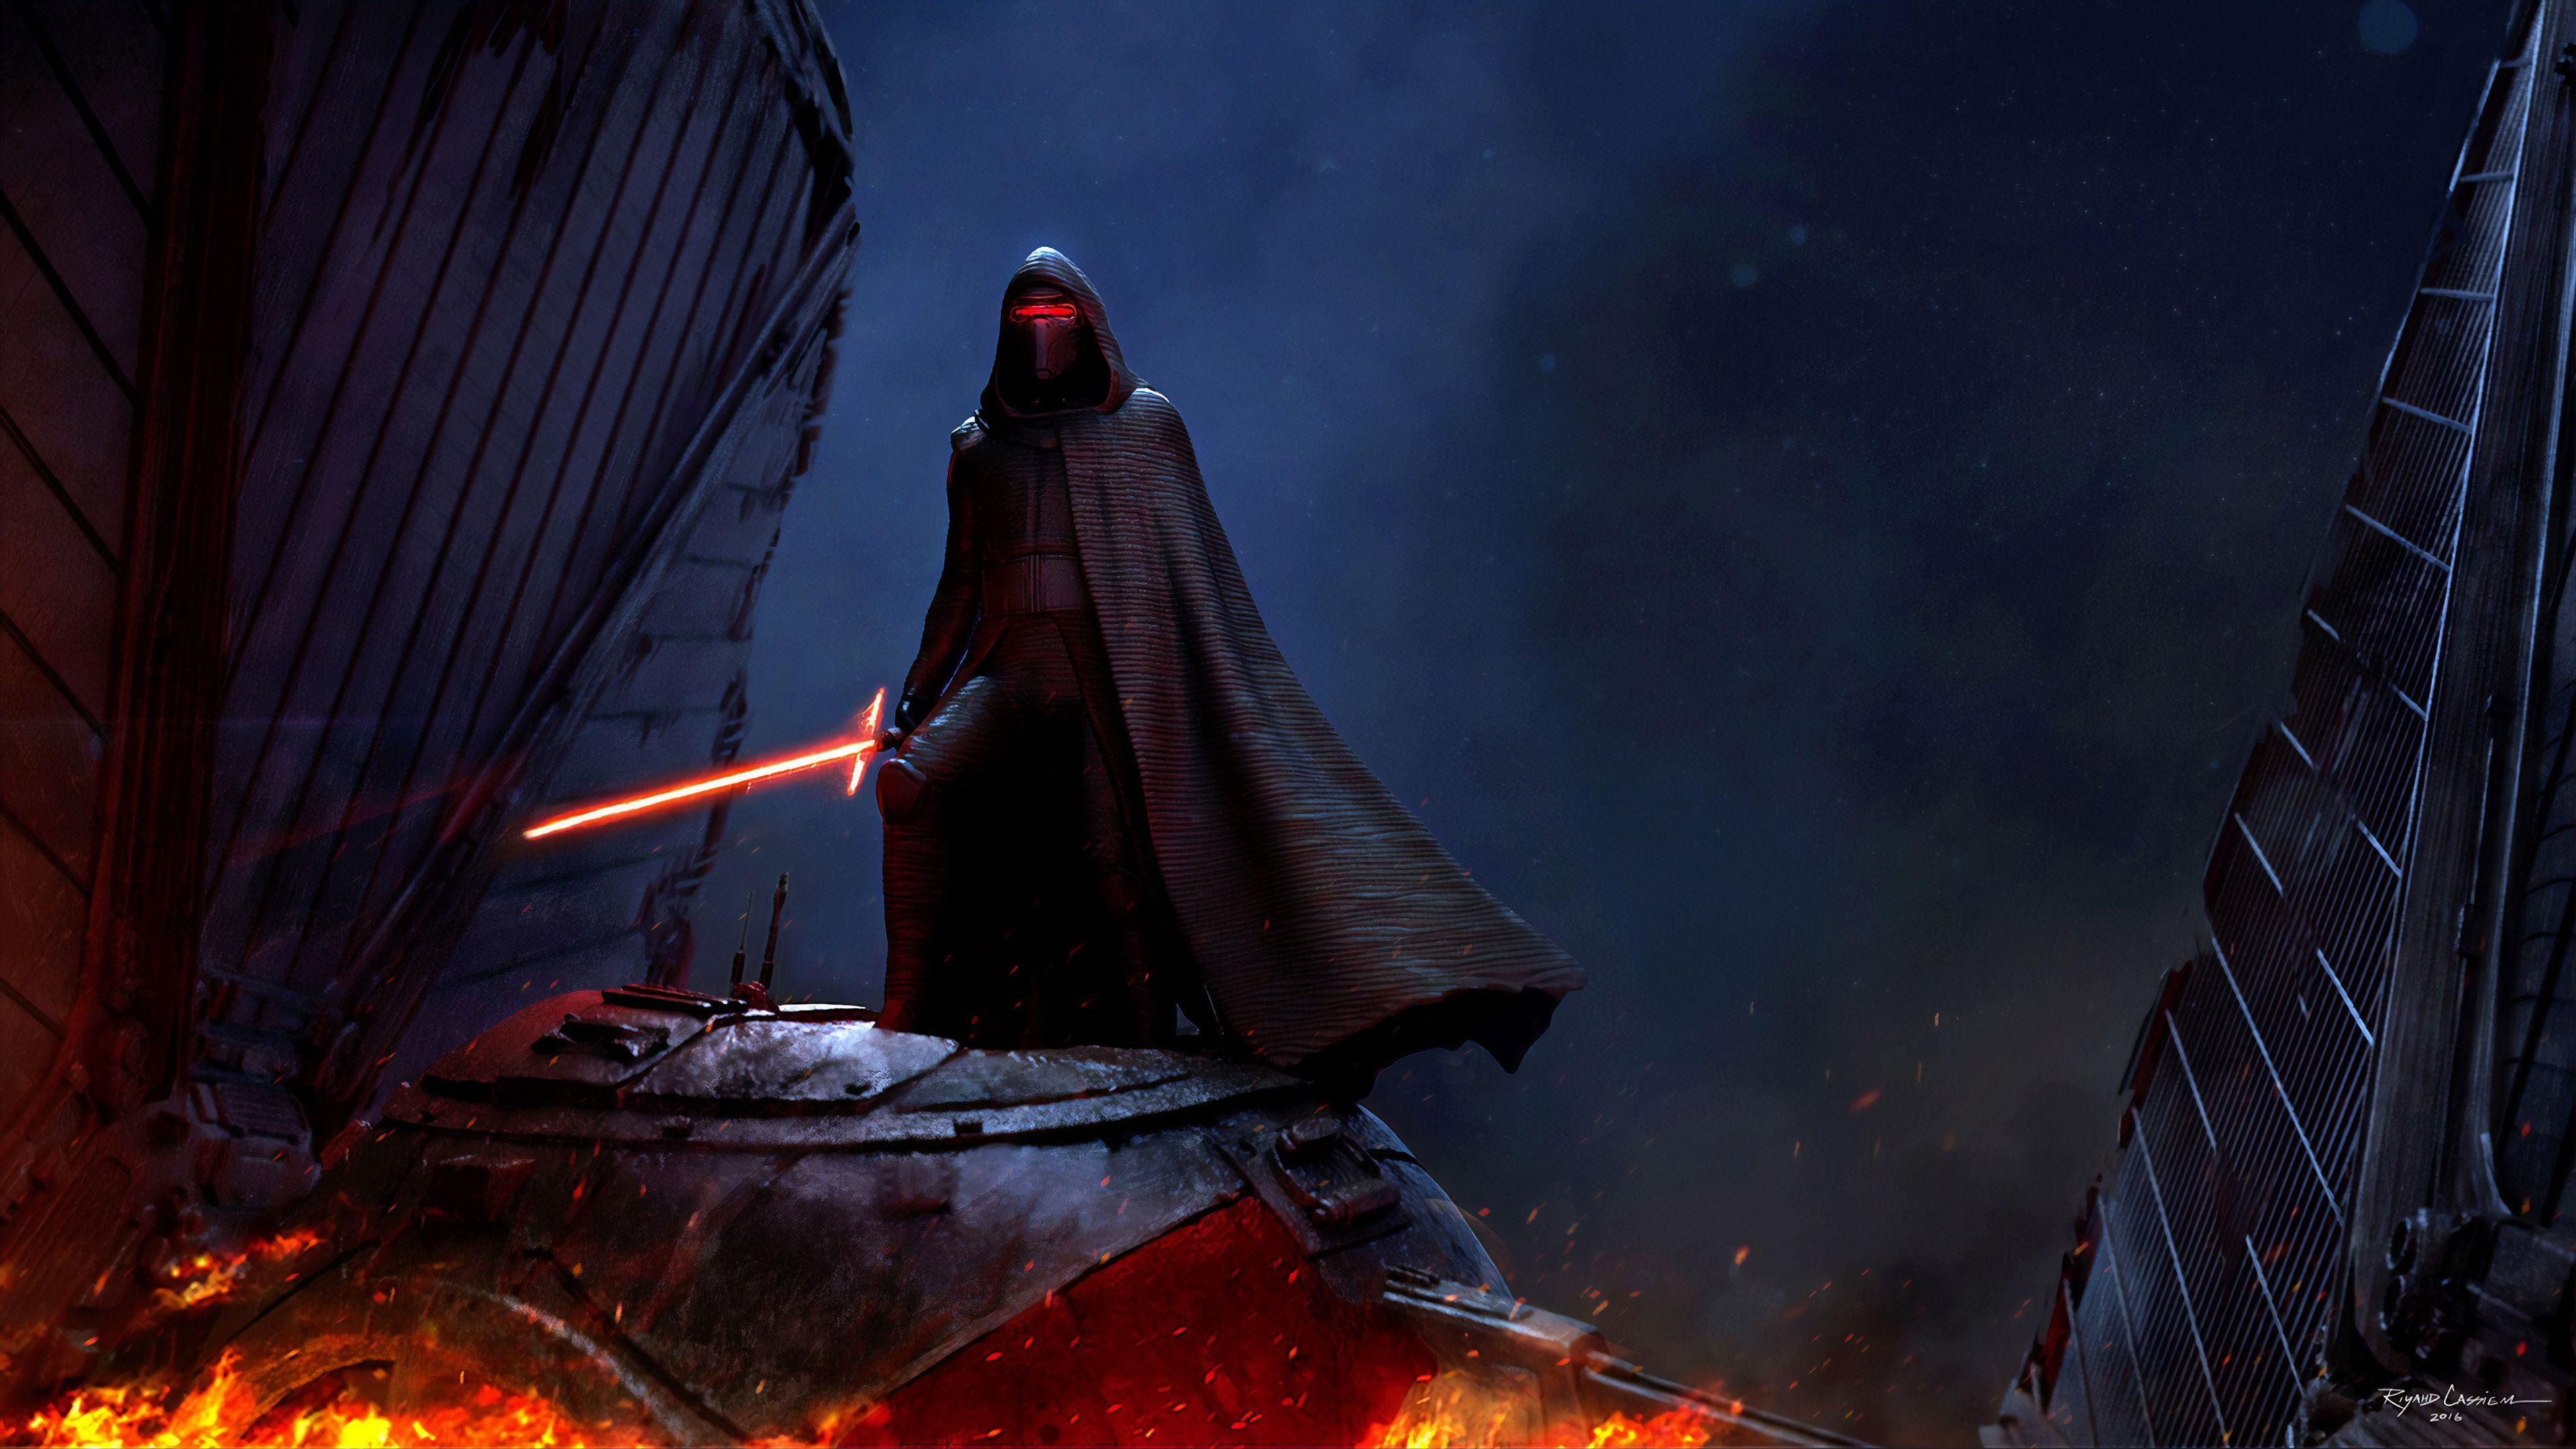 Star Wars 4k Wallpapers Top Free Star Wars 4k Backgrounds